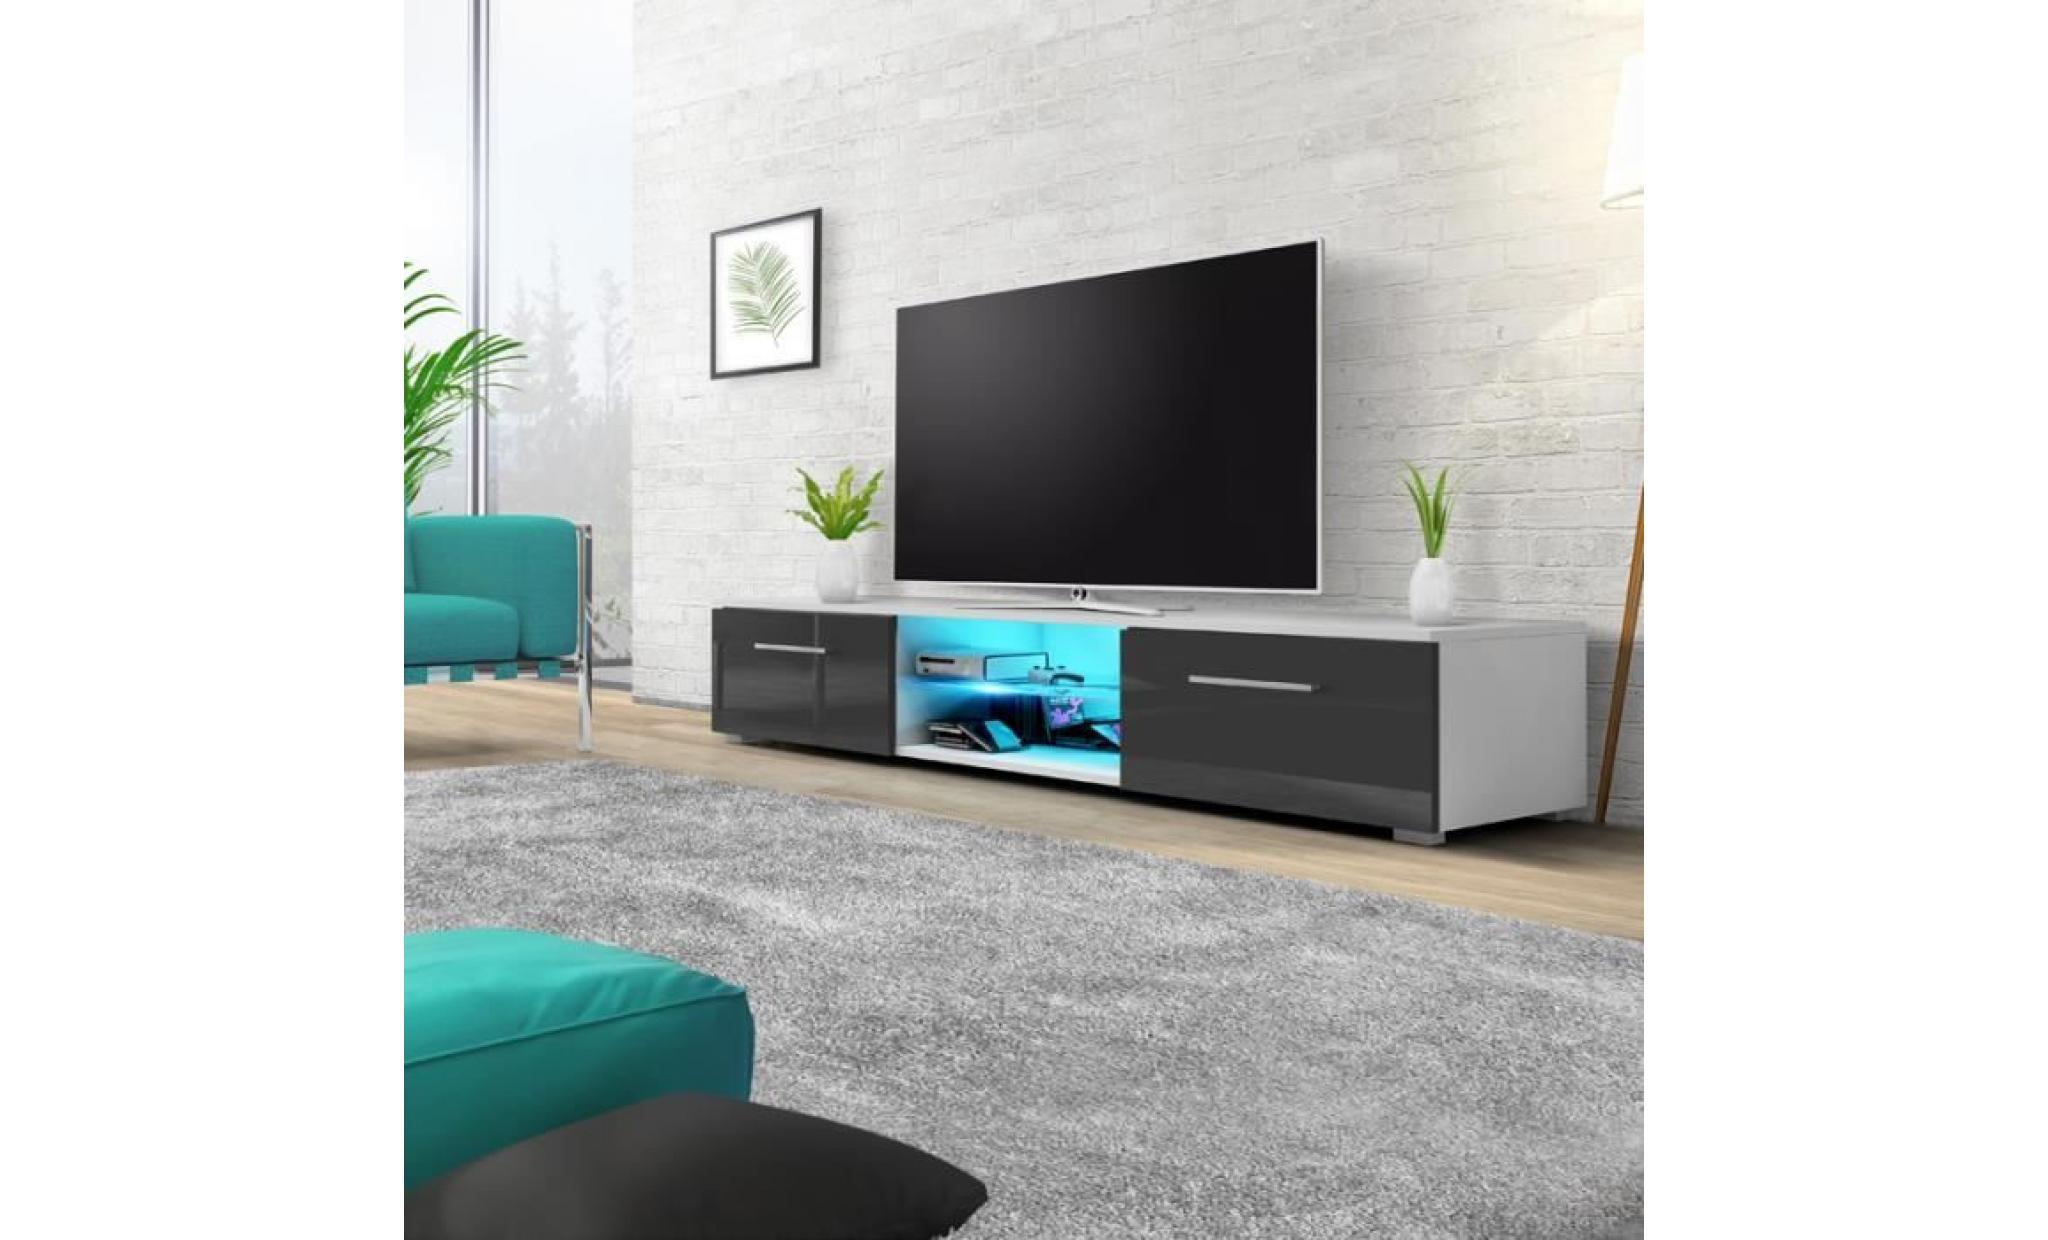 meuble tv / meuble salon edith 140 cm blanc mat / gris brillant avec led  bleue style minimaliste style moderne